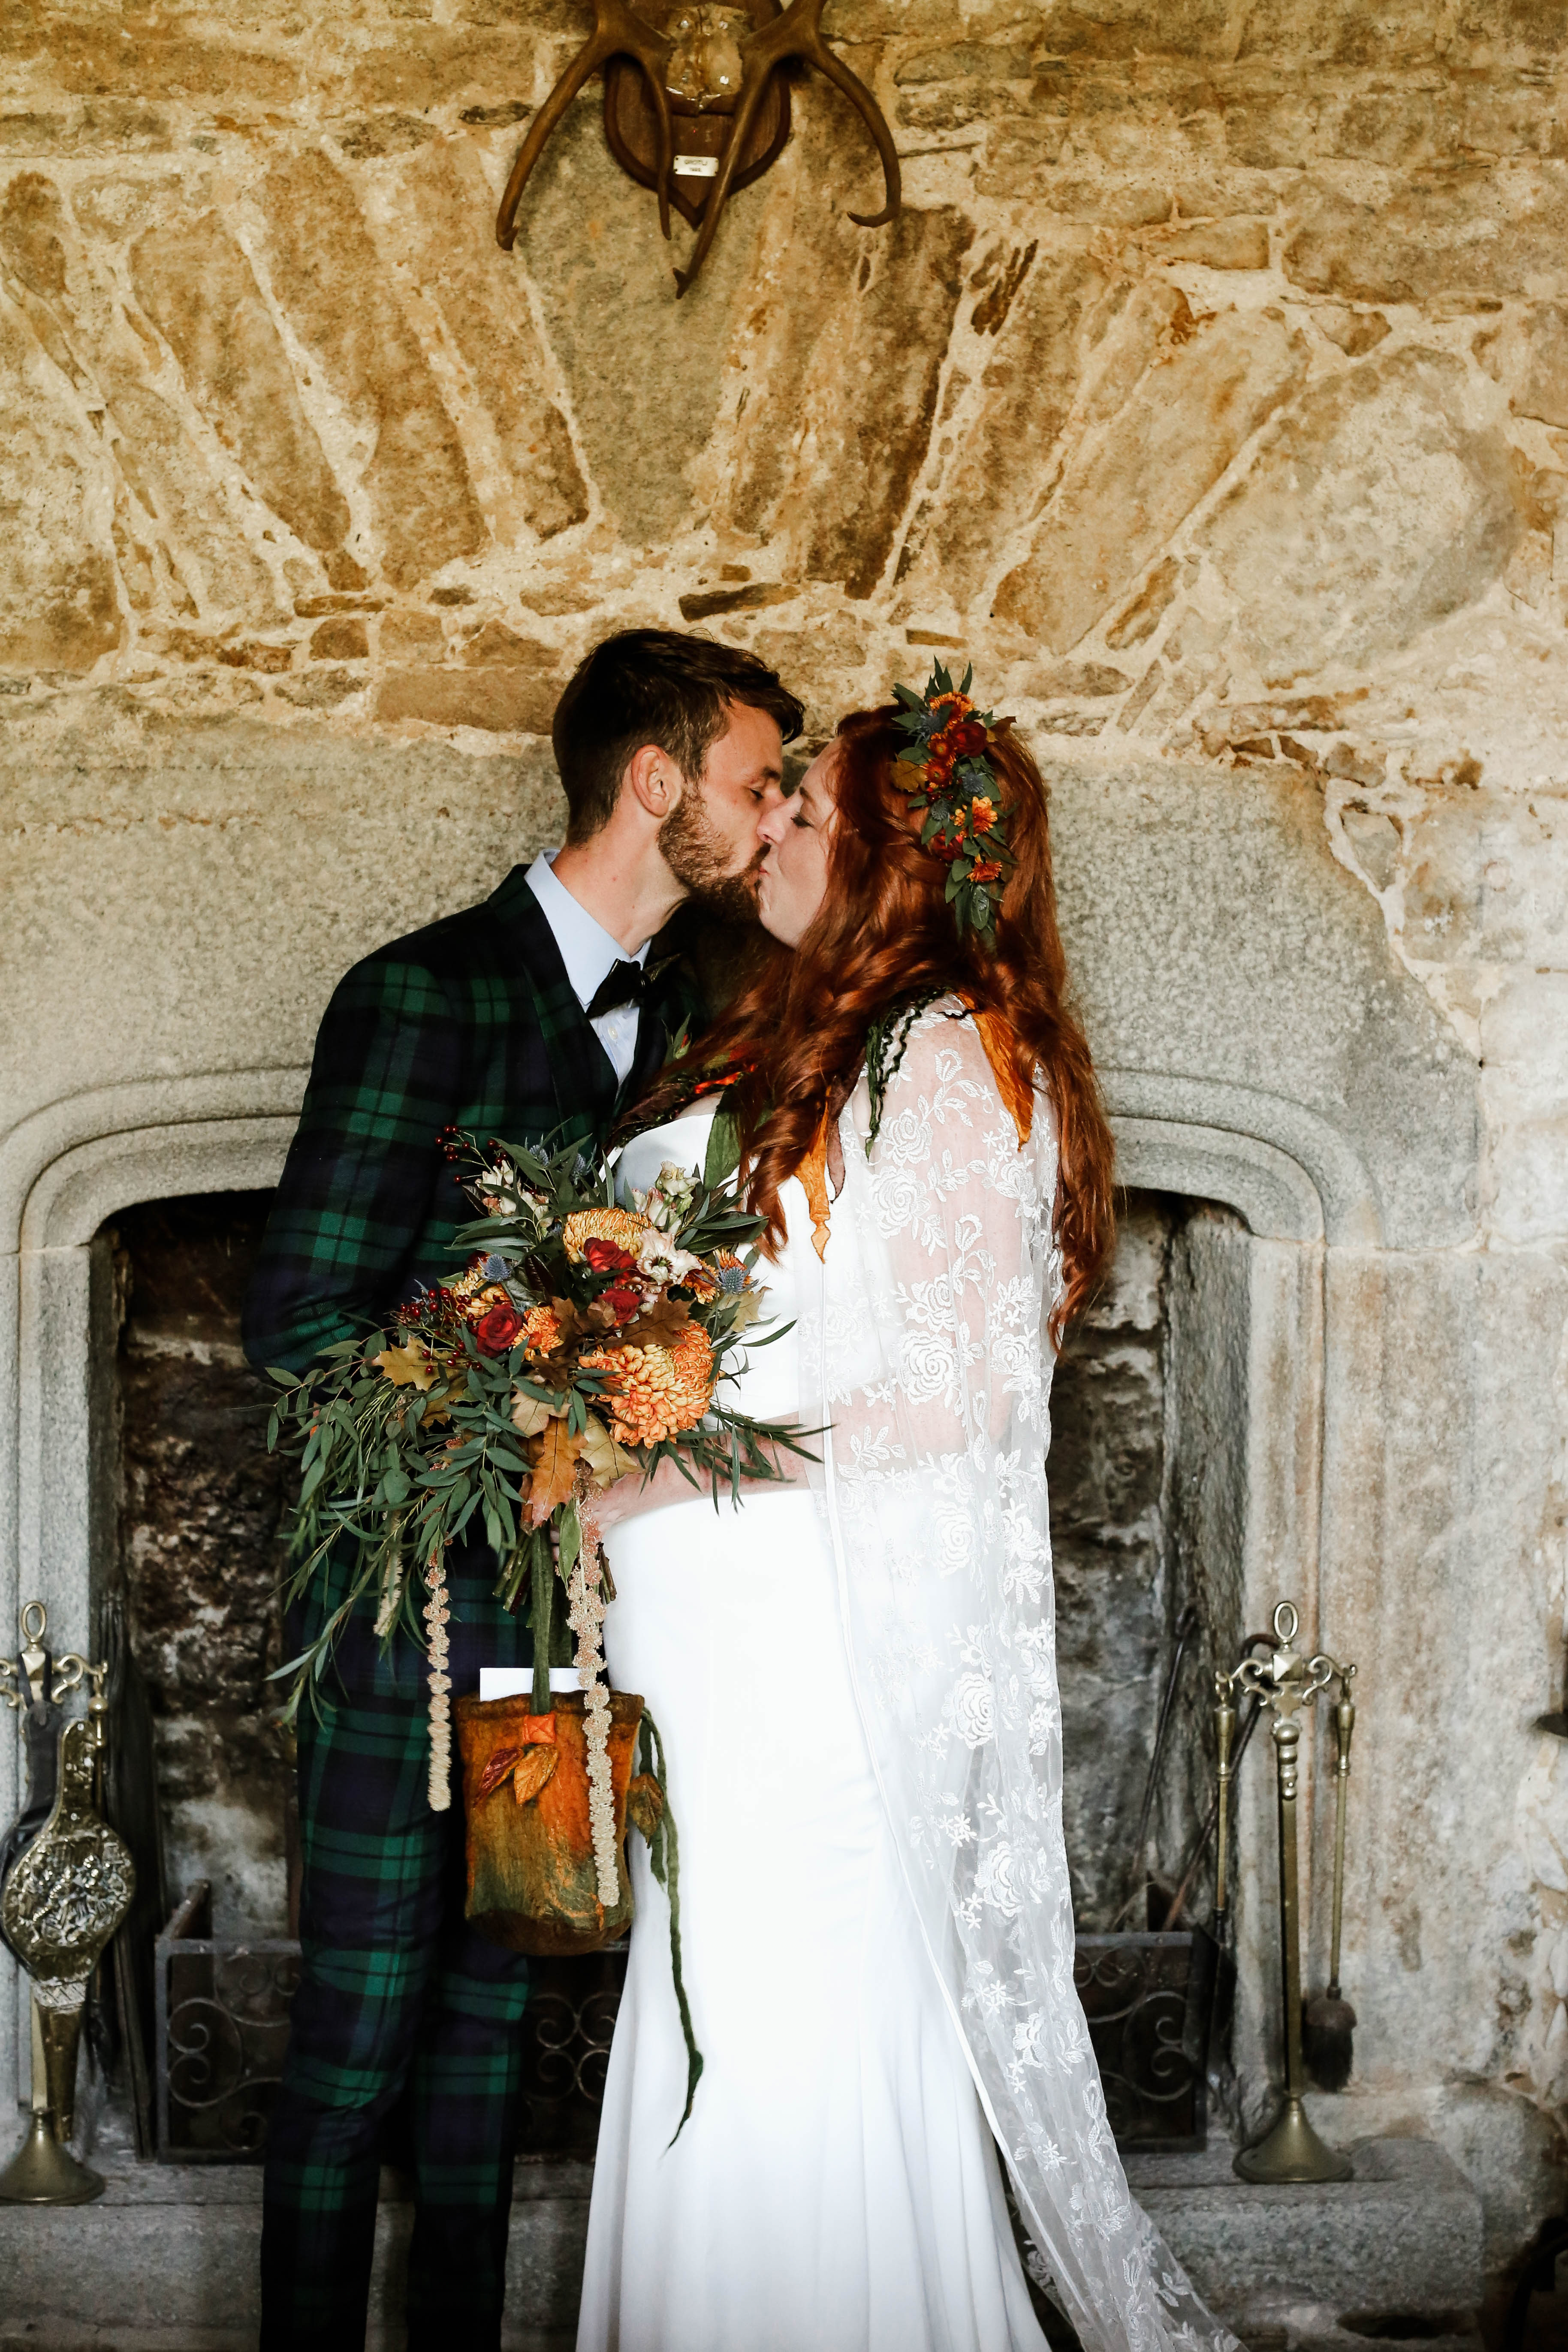 Pengersick Wedding Ceremony